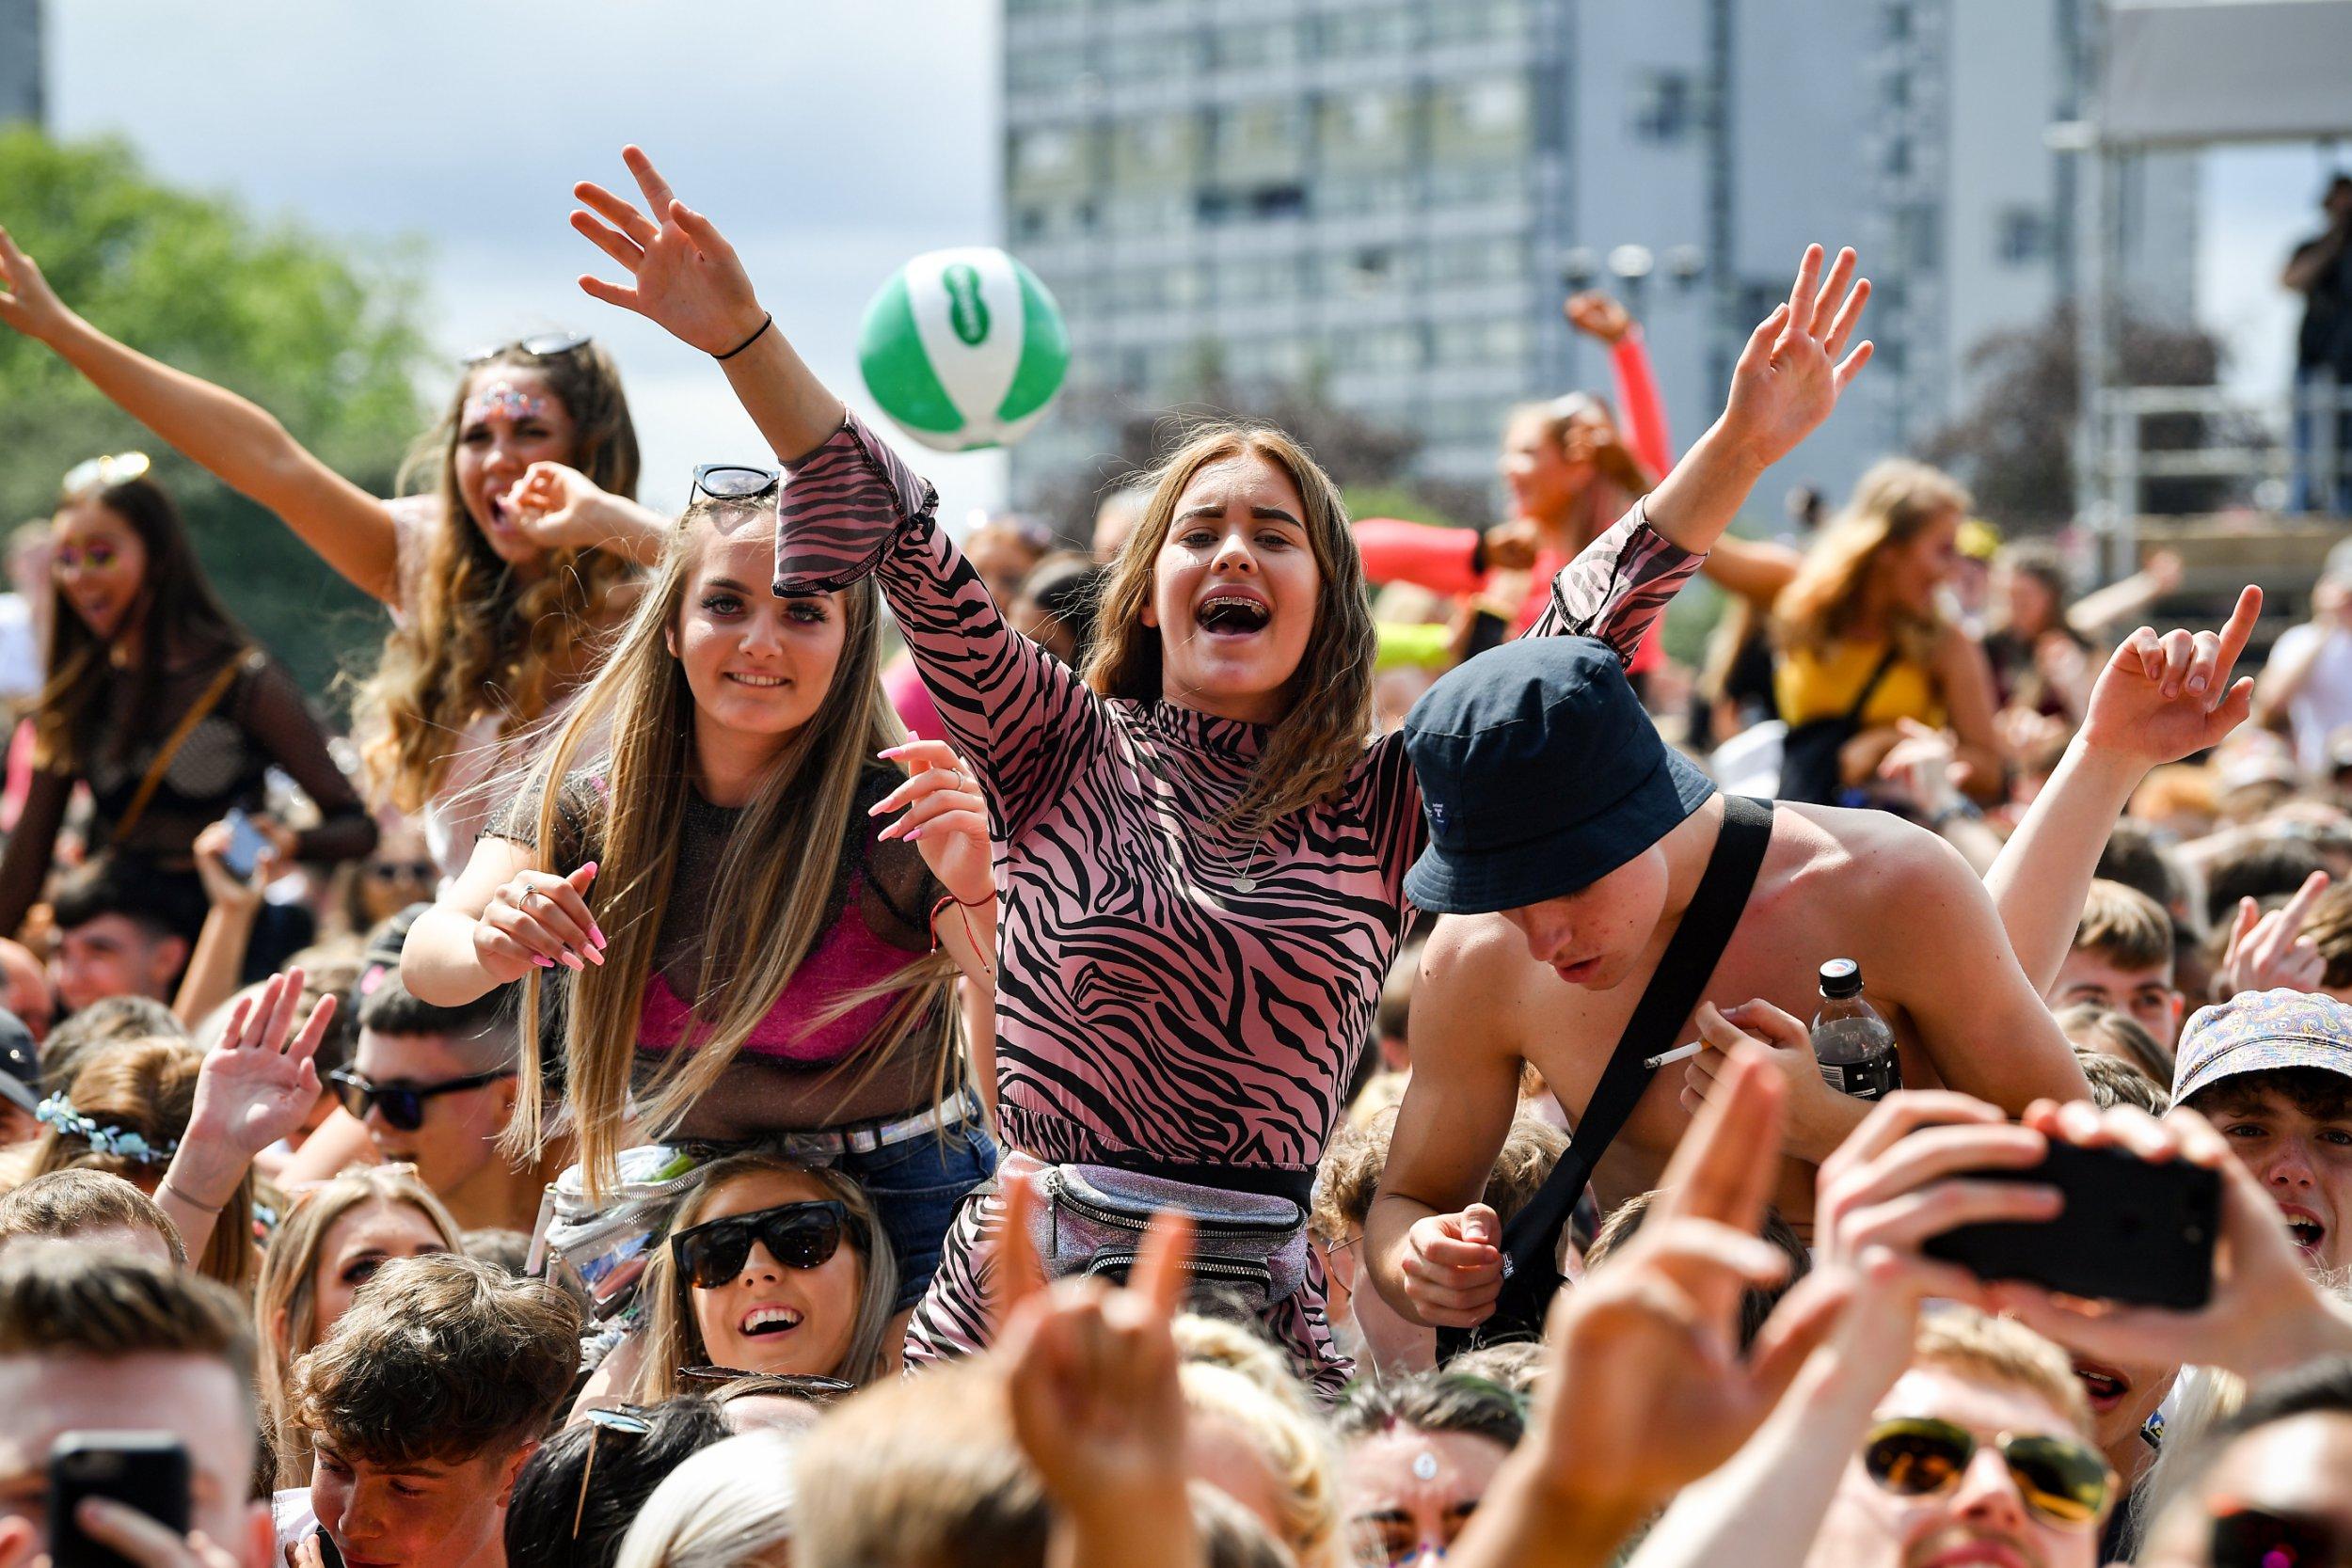 Music fans during Glasgow's TRNSMT Festival